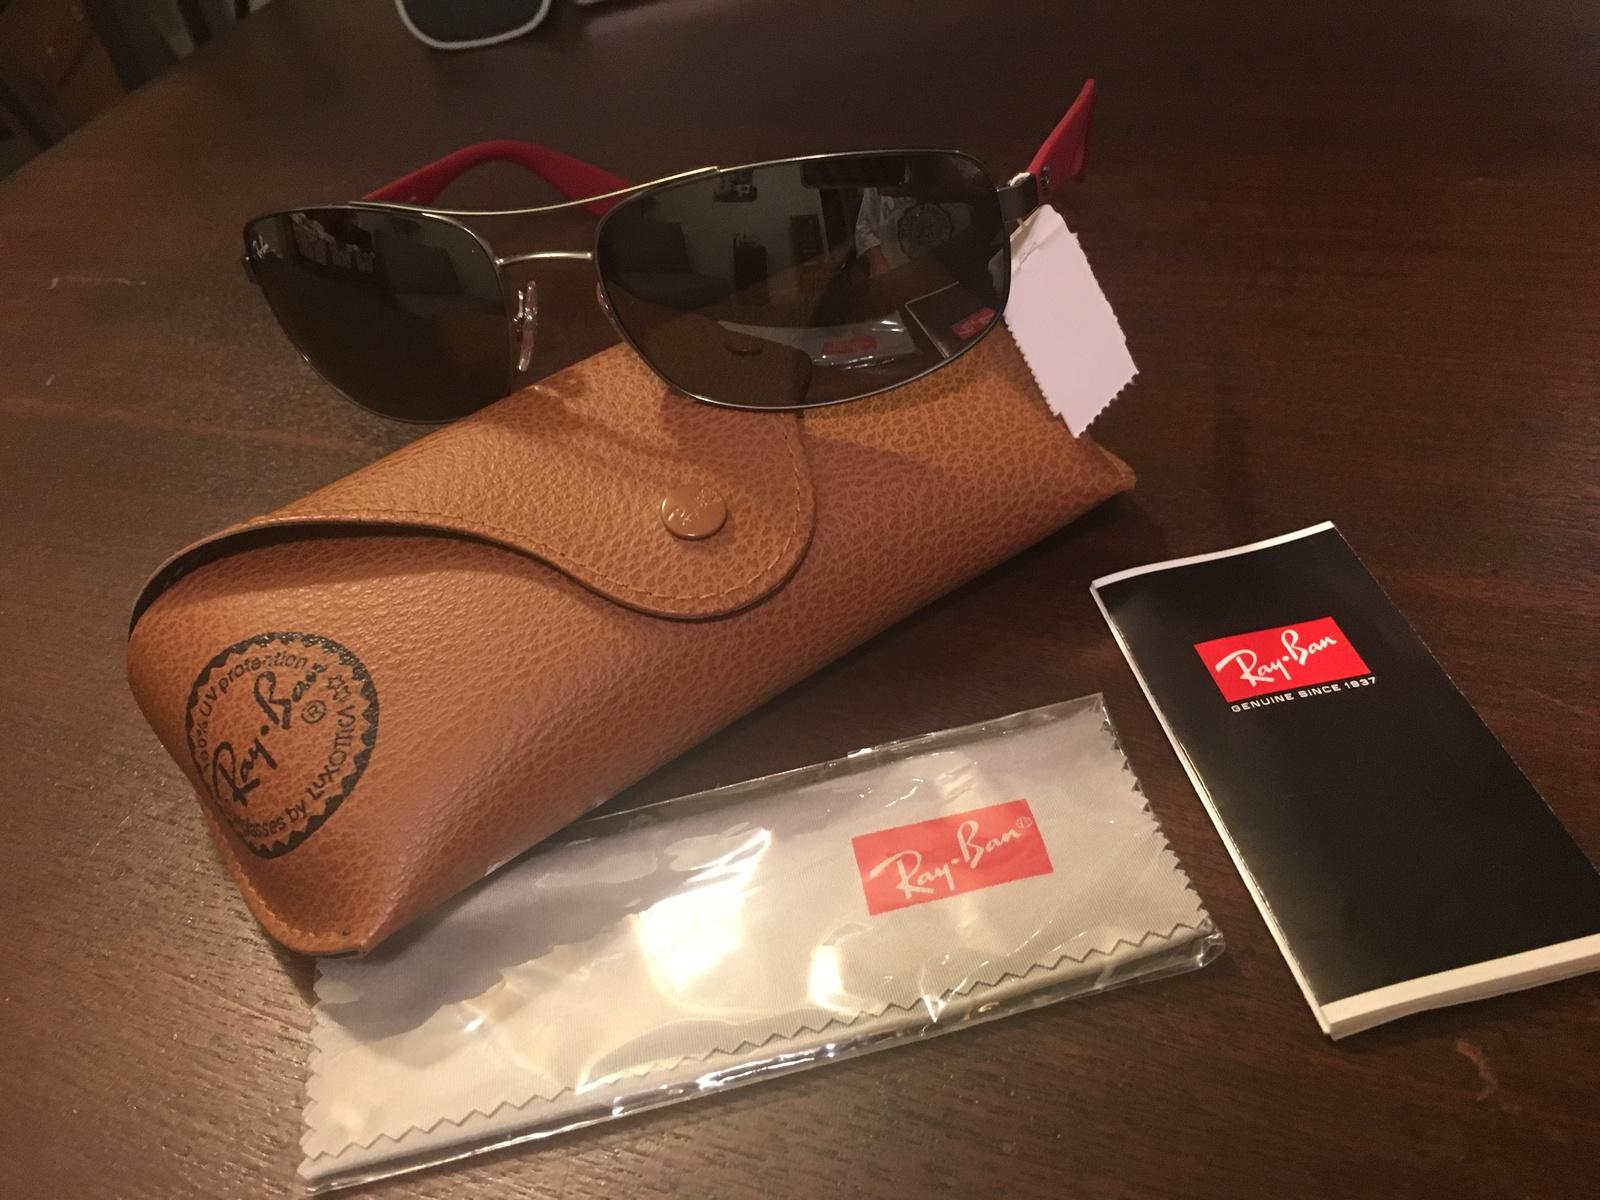 d2987b98cd3 RAY BAN Sunglasses 3527 MATTE GUNMETAL RED GRAY MIRROR SILVER 029 6G